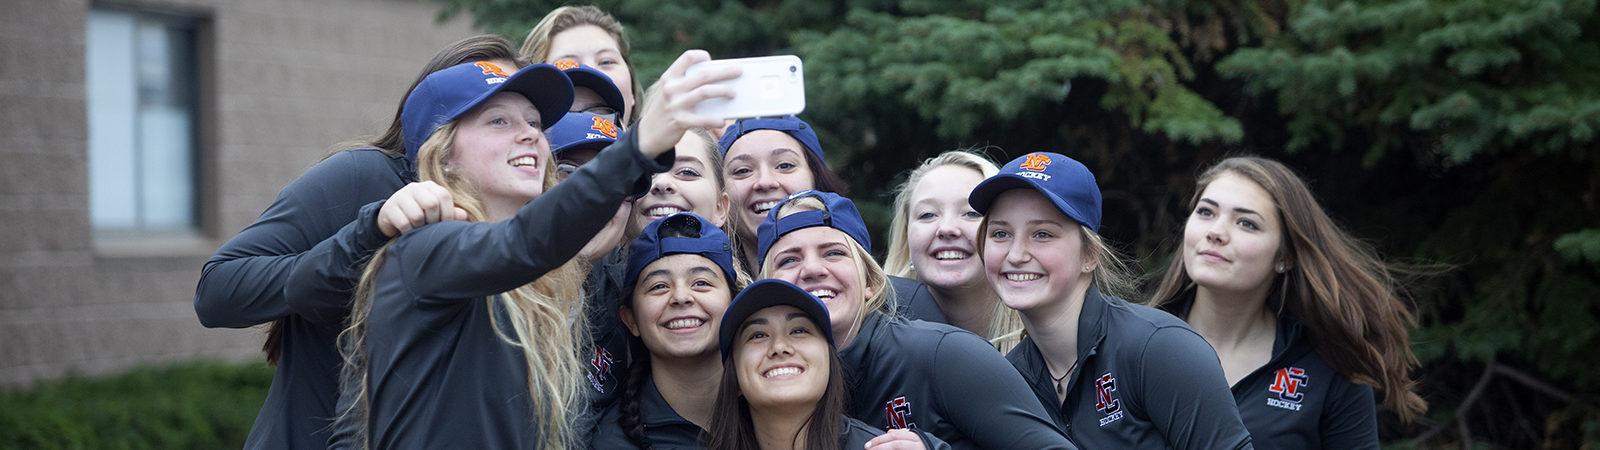 Northland College Women's Hockey Tam Group Selfie